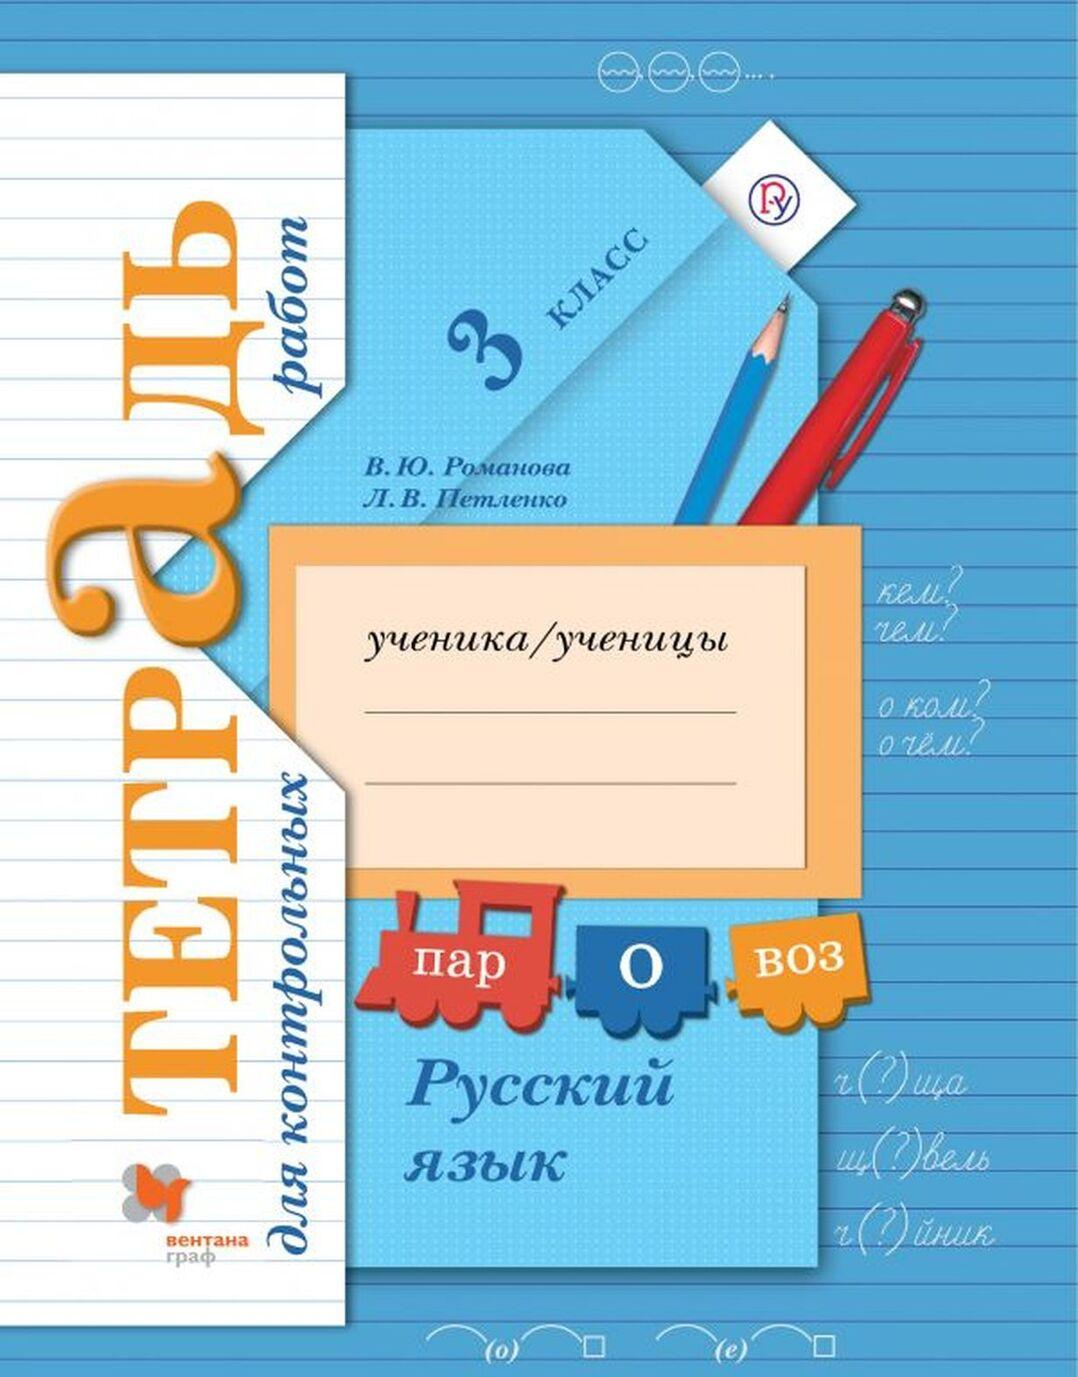 Russkij jazyk. 3 klass. Tetrad dlja kontrolnykh rabot | Romanova Vladislava Jurevna, Petlenko Lidija Vladimirovna